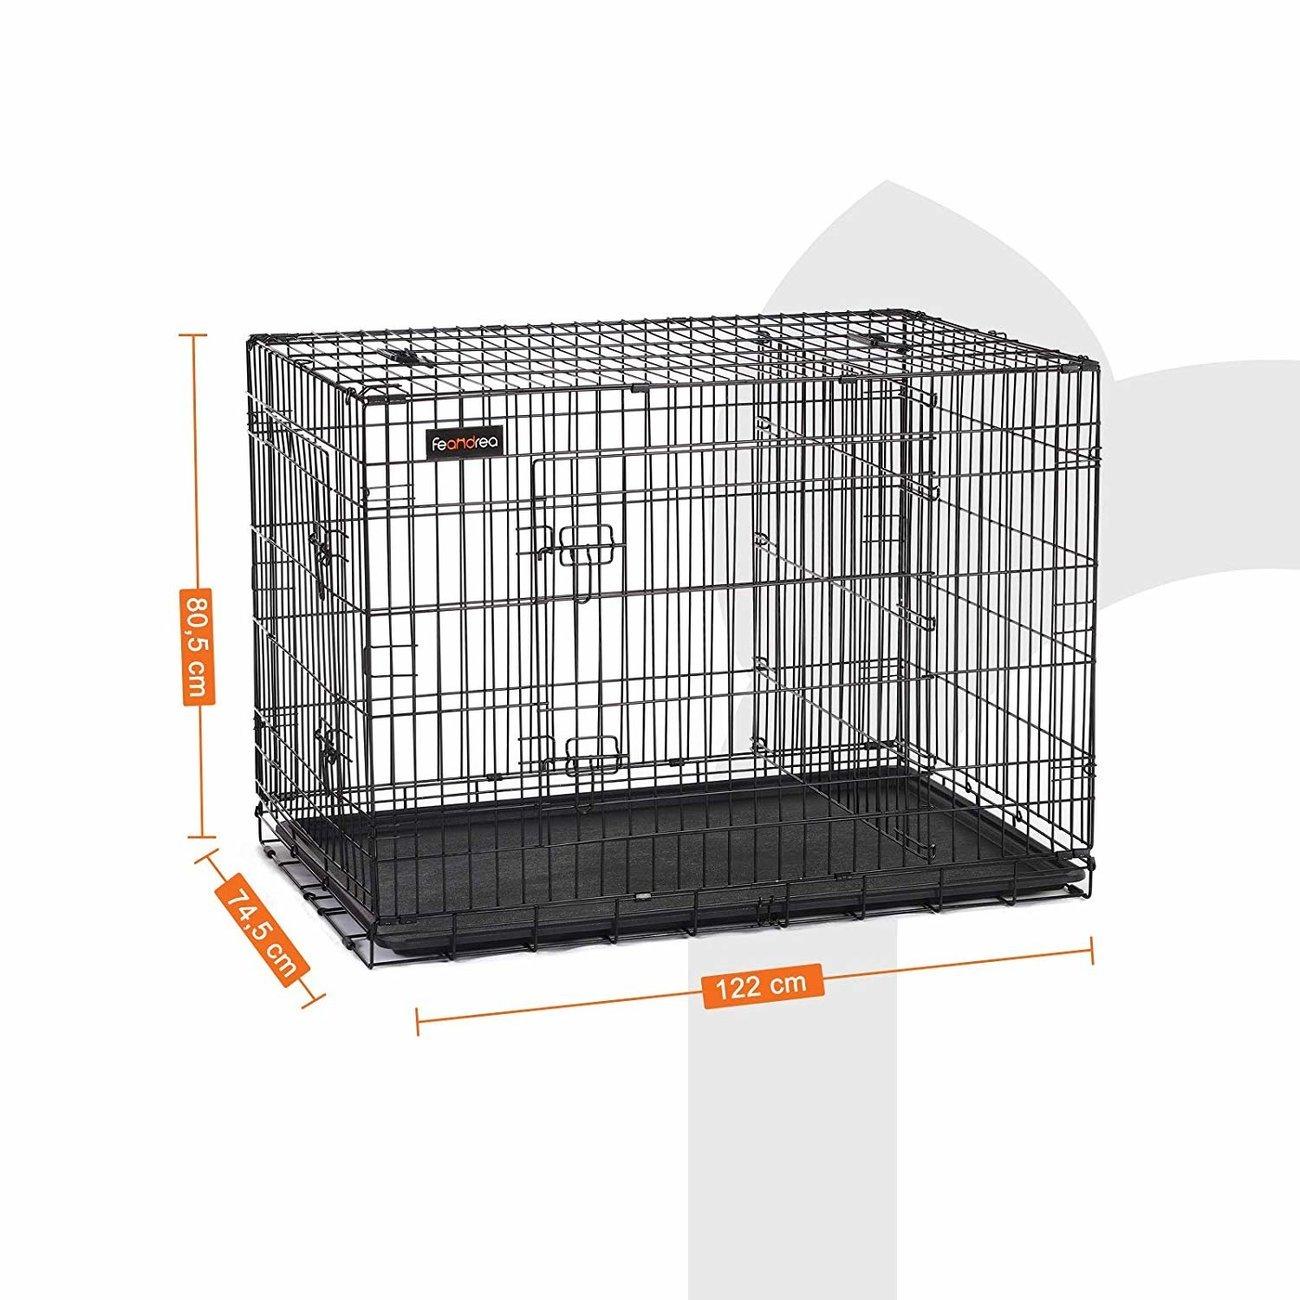 SONGMICS FEANDREA Hundekäfig, Hundebox mit Trennwand, 2 Türen, 122 x 74.5 x 80.5 cm (L x B x H)